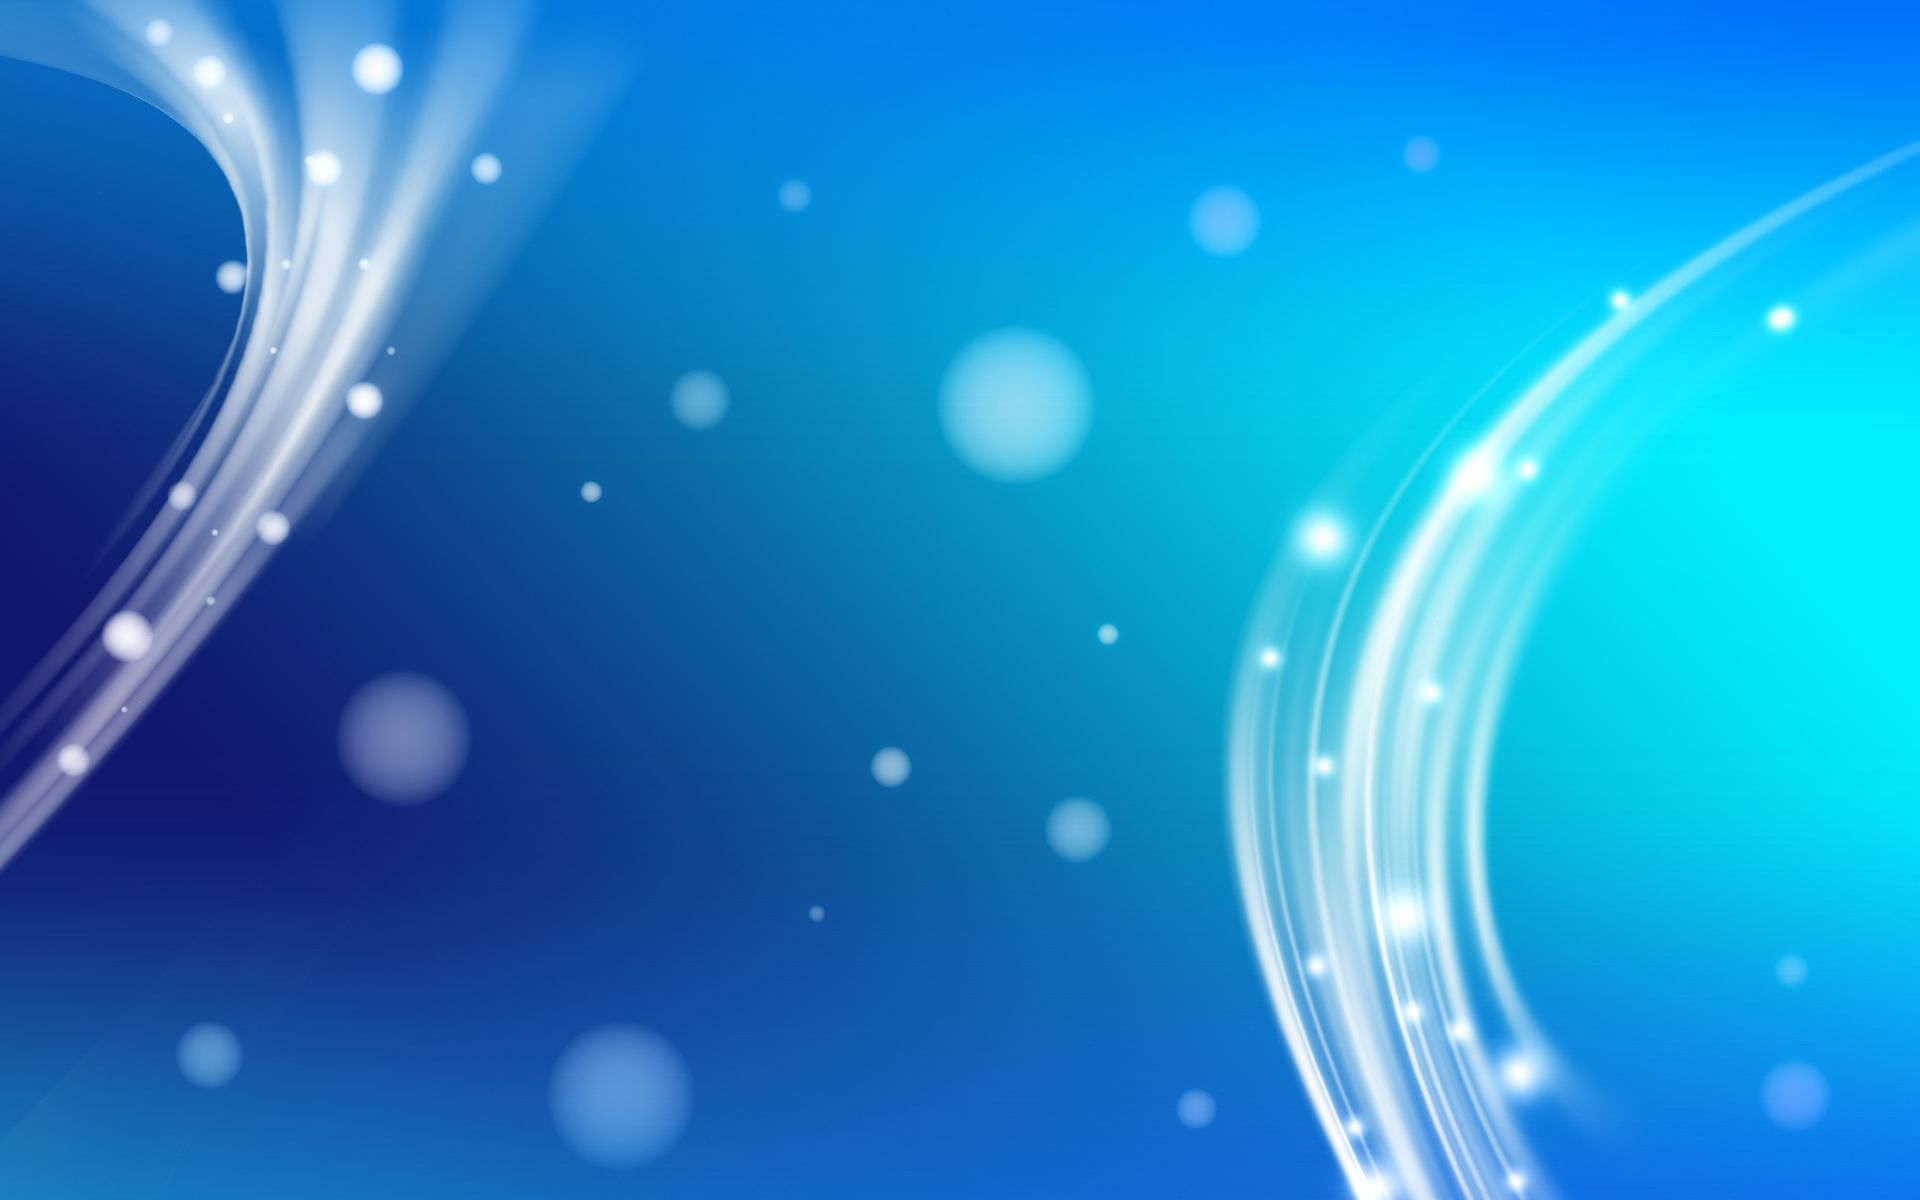 Light Blue Wallpaper High Definition For Background Wallpaper 1920x1200 Px 510 86 Kb Light Blue Background Blue Background Images Blue Background Wallpapers